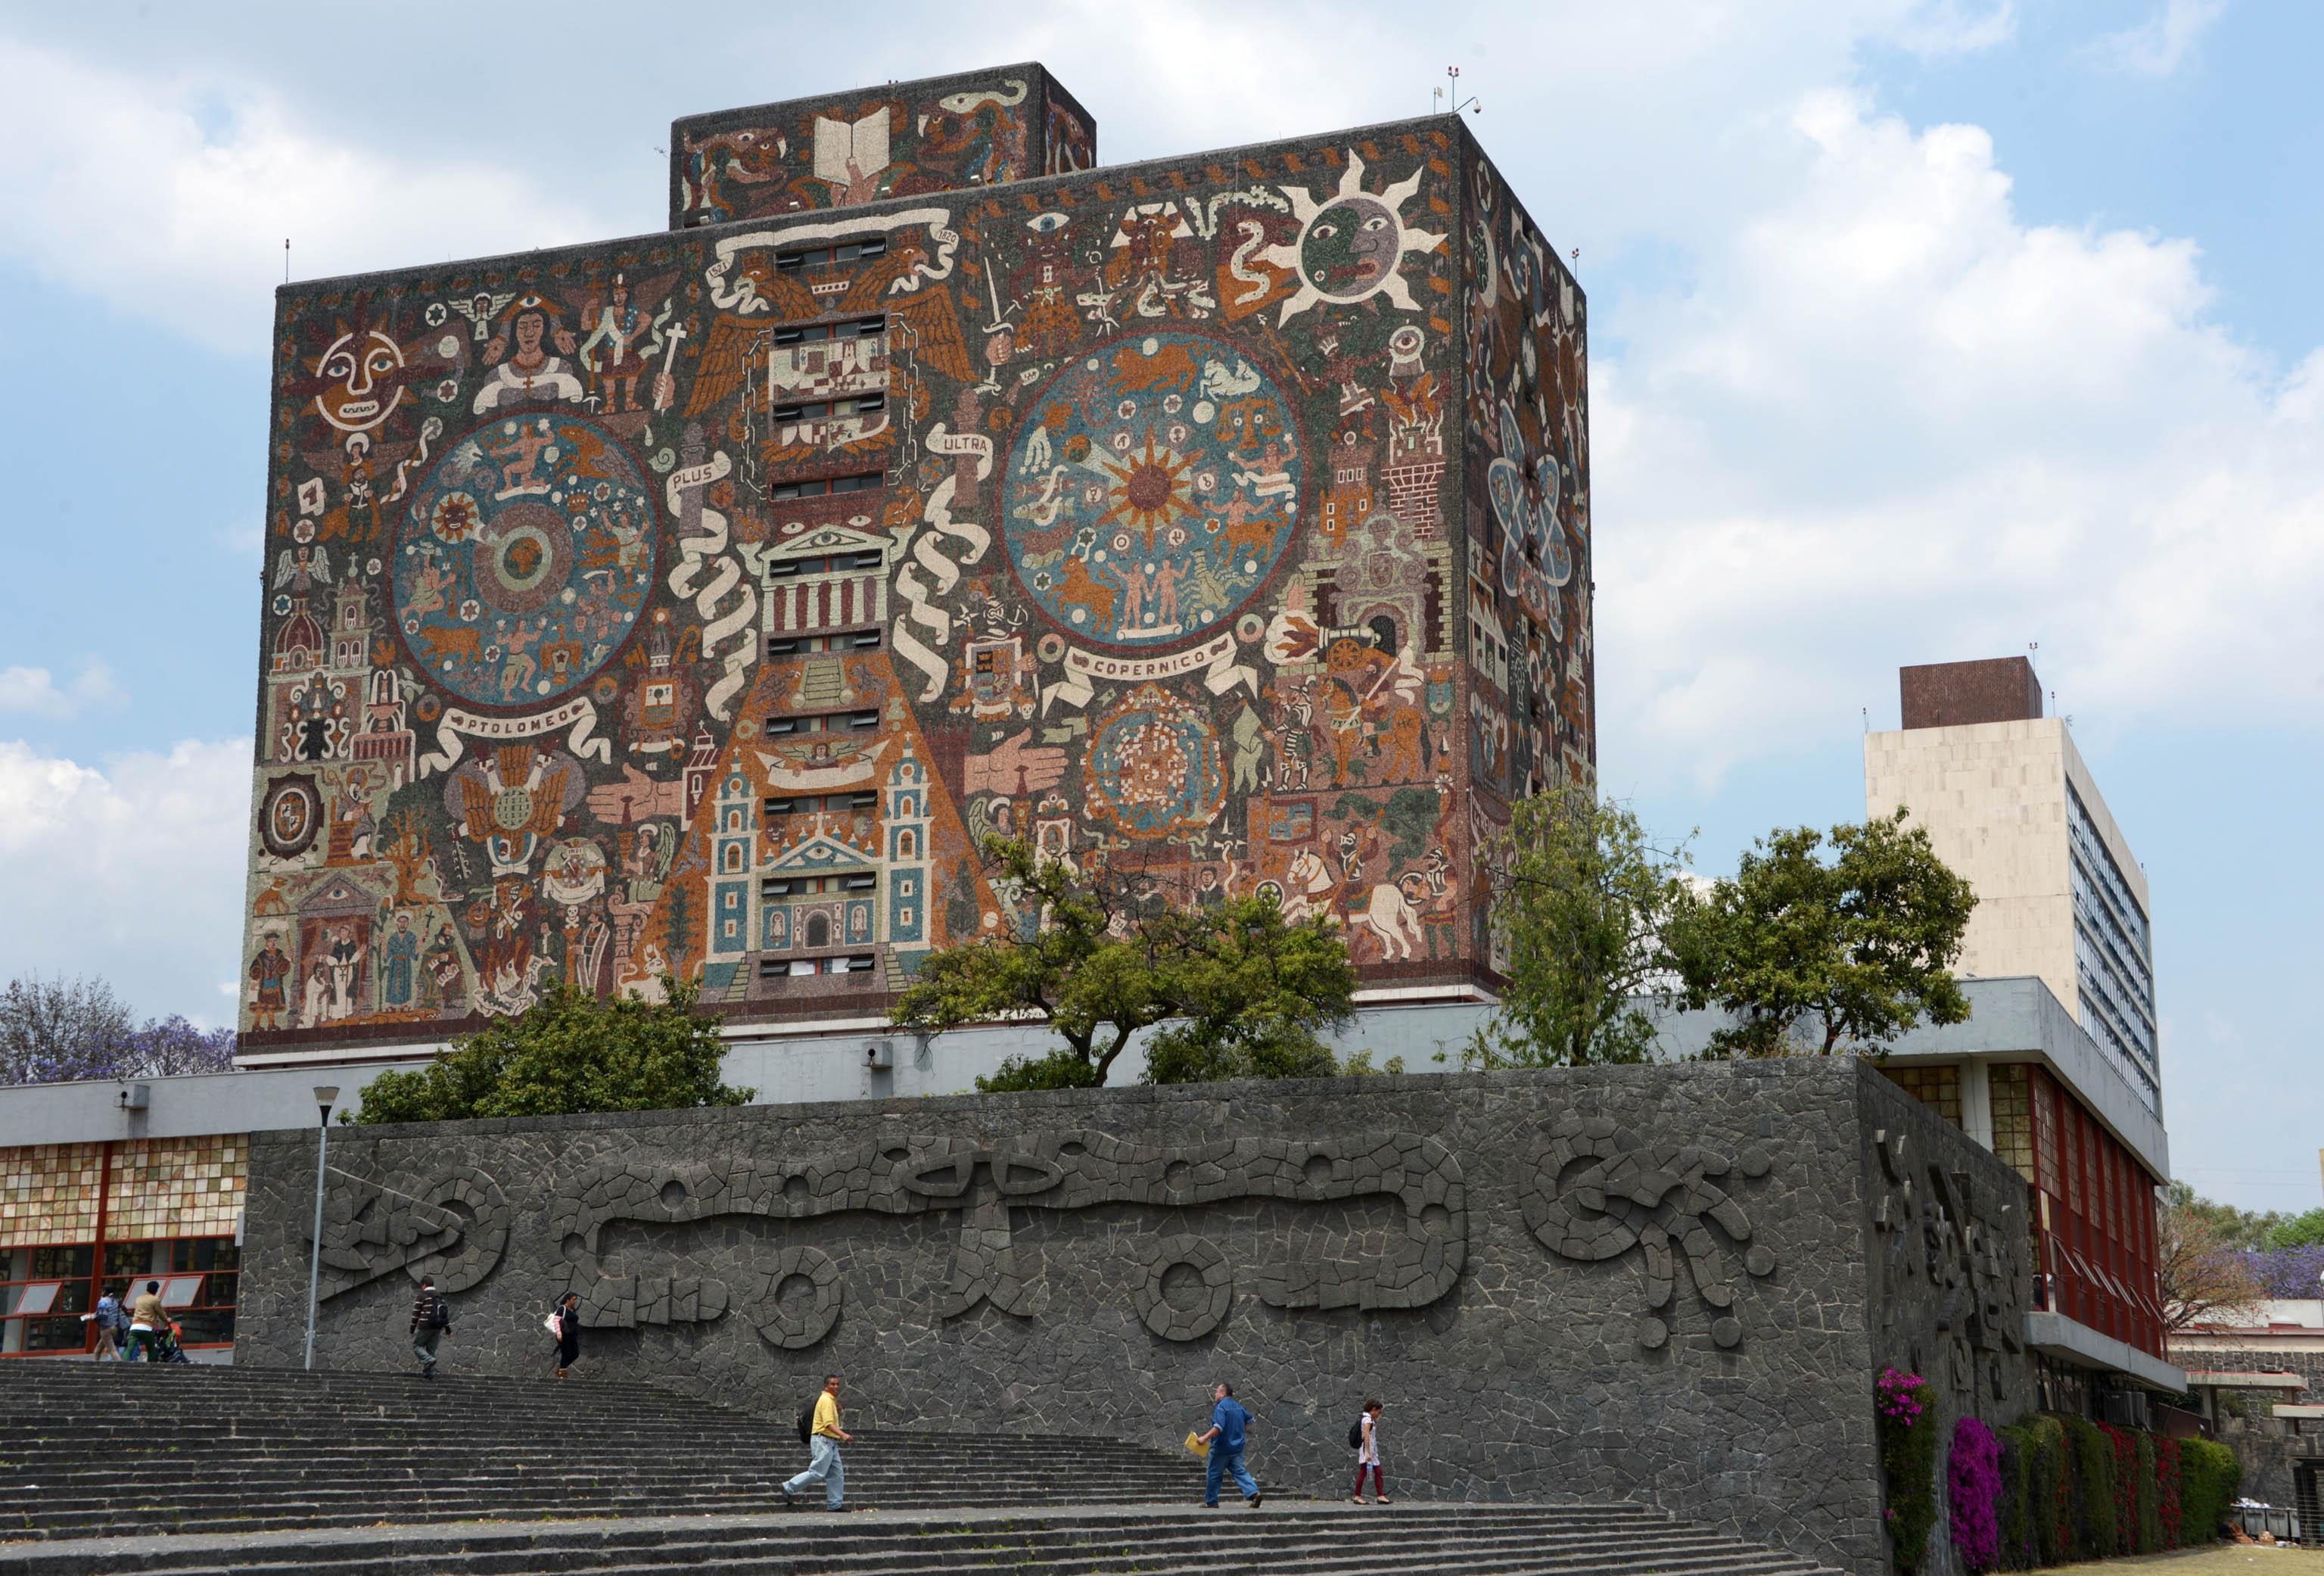 UNAM: Cultural heritage of Humanity